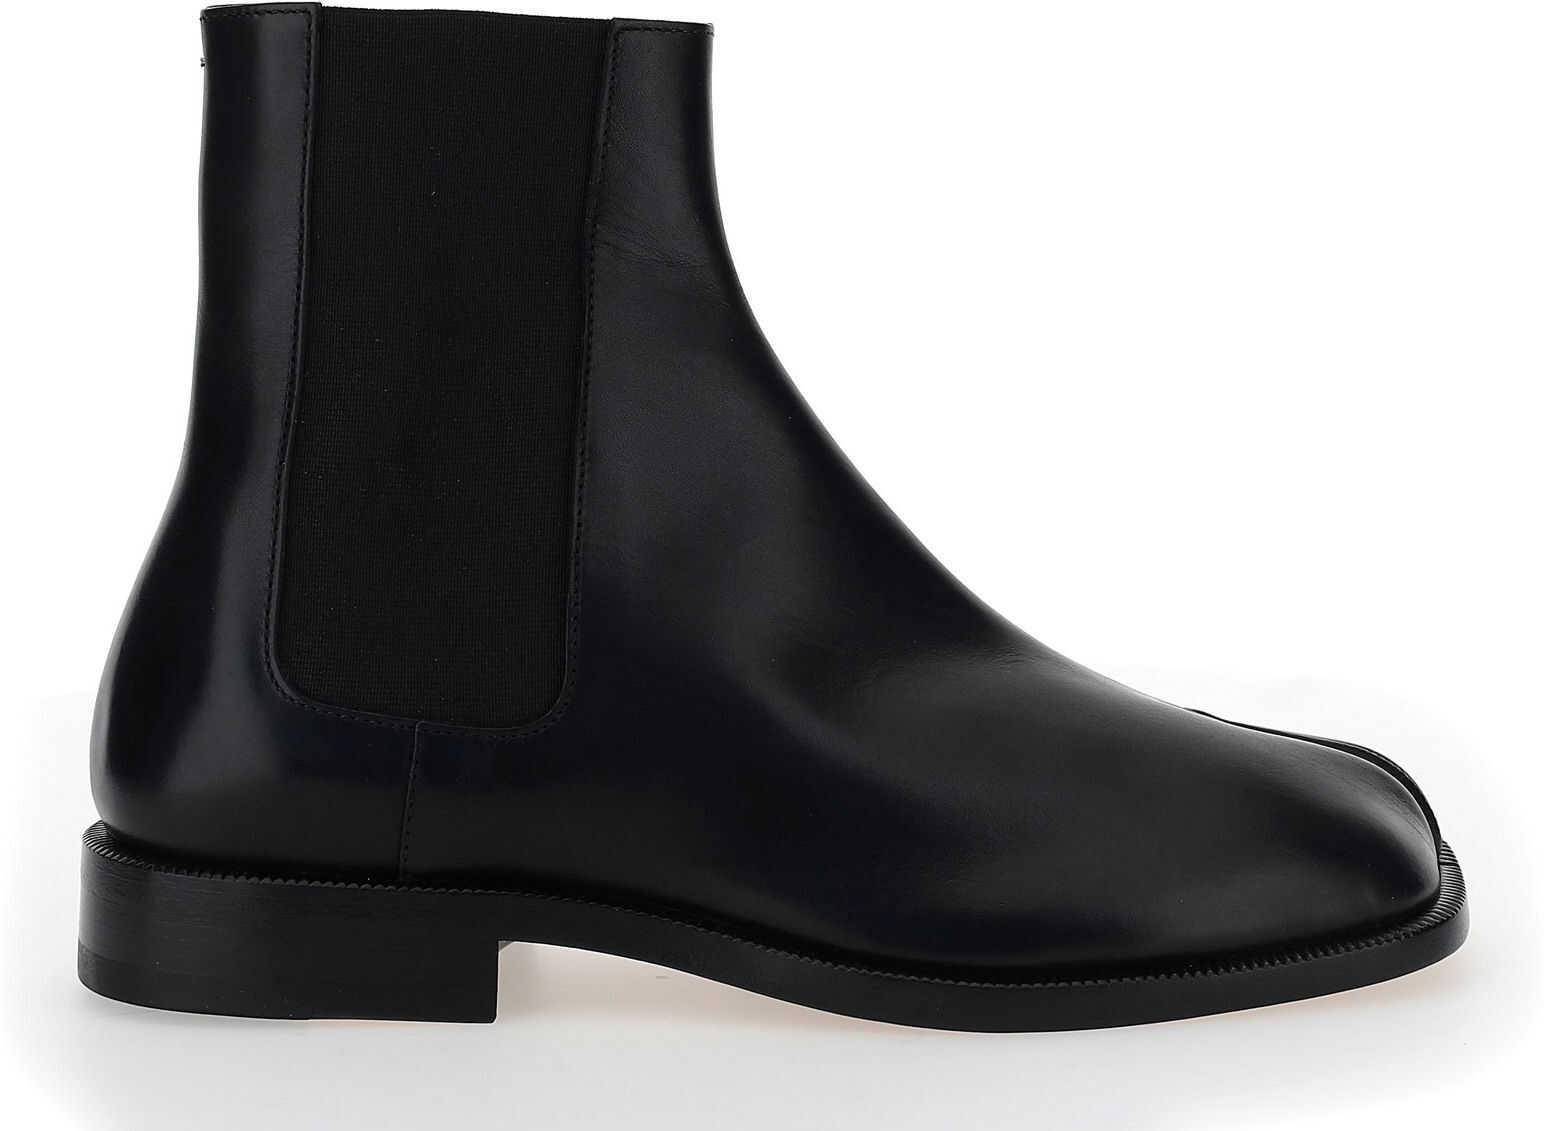 Maison Margiela Boots S57WU0150P3292 BLACK imagine b-mall.ro